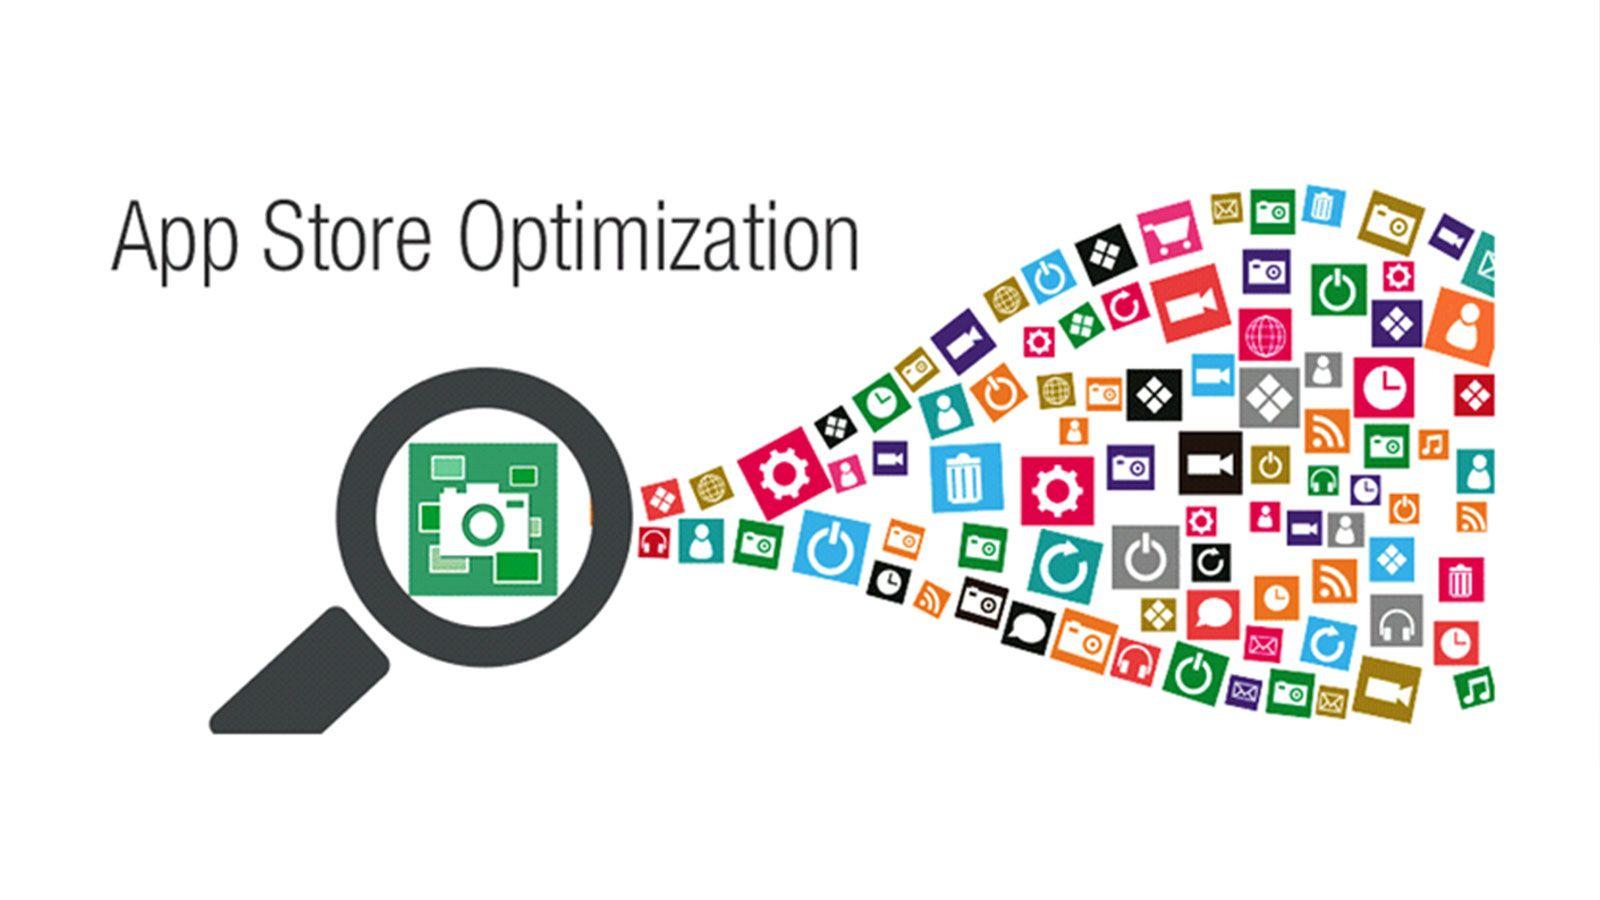 ASO Company in India, Mobile APP Store Optimization Services, App Store Optimization Service in Gurgaon, APP Store Optimization Services